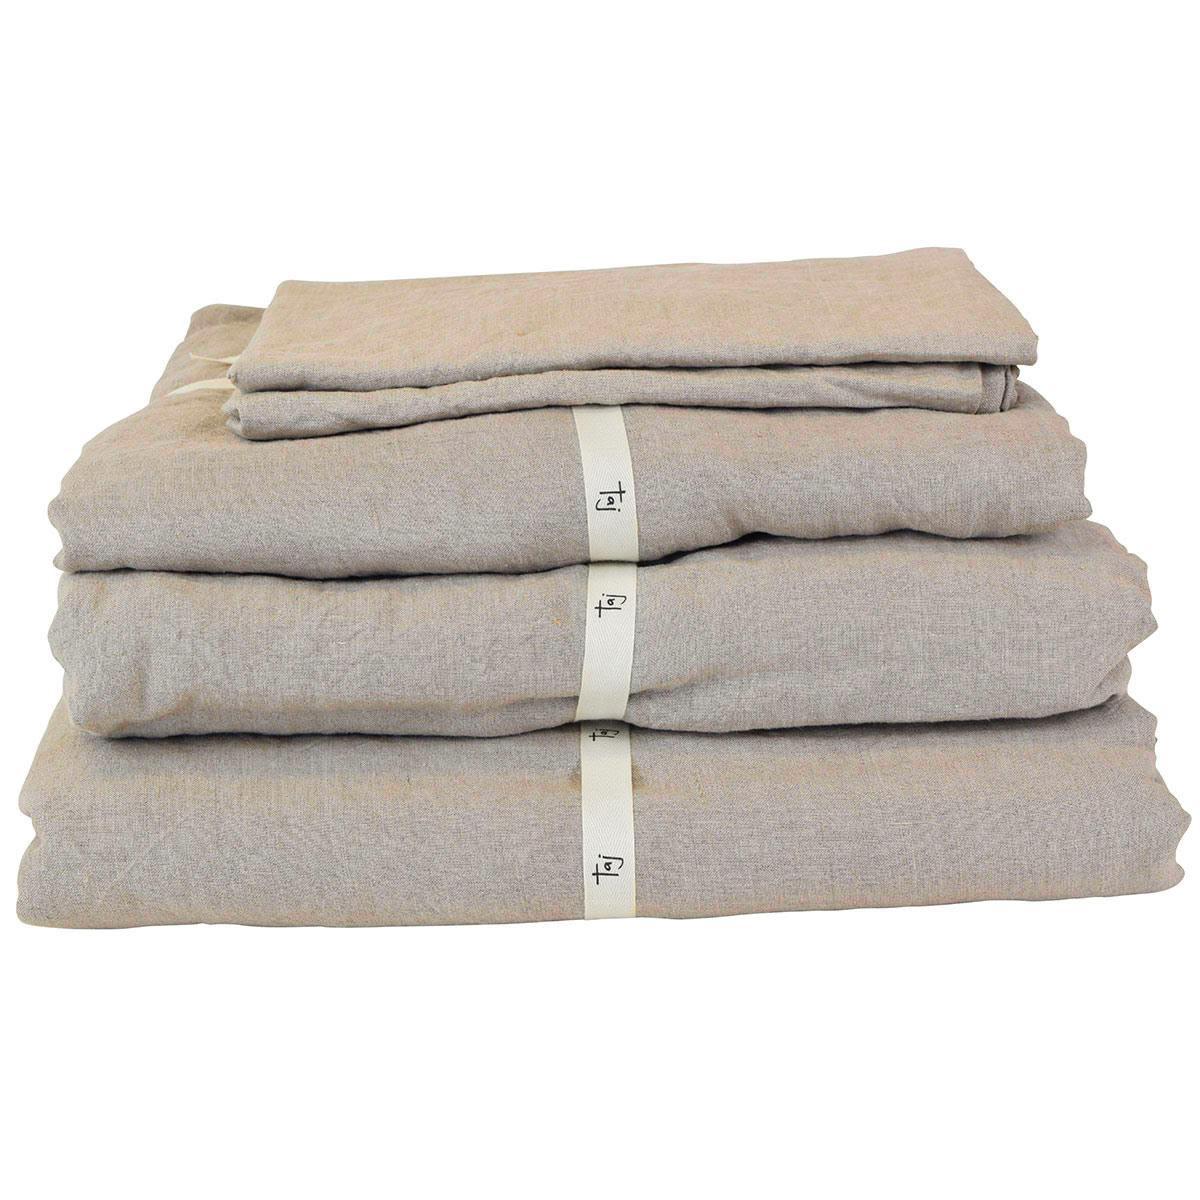 Taj French Linen Flat Sheet, King, Natural